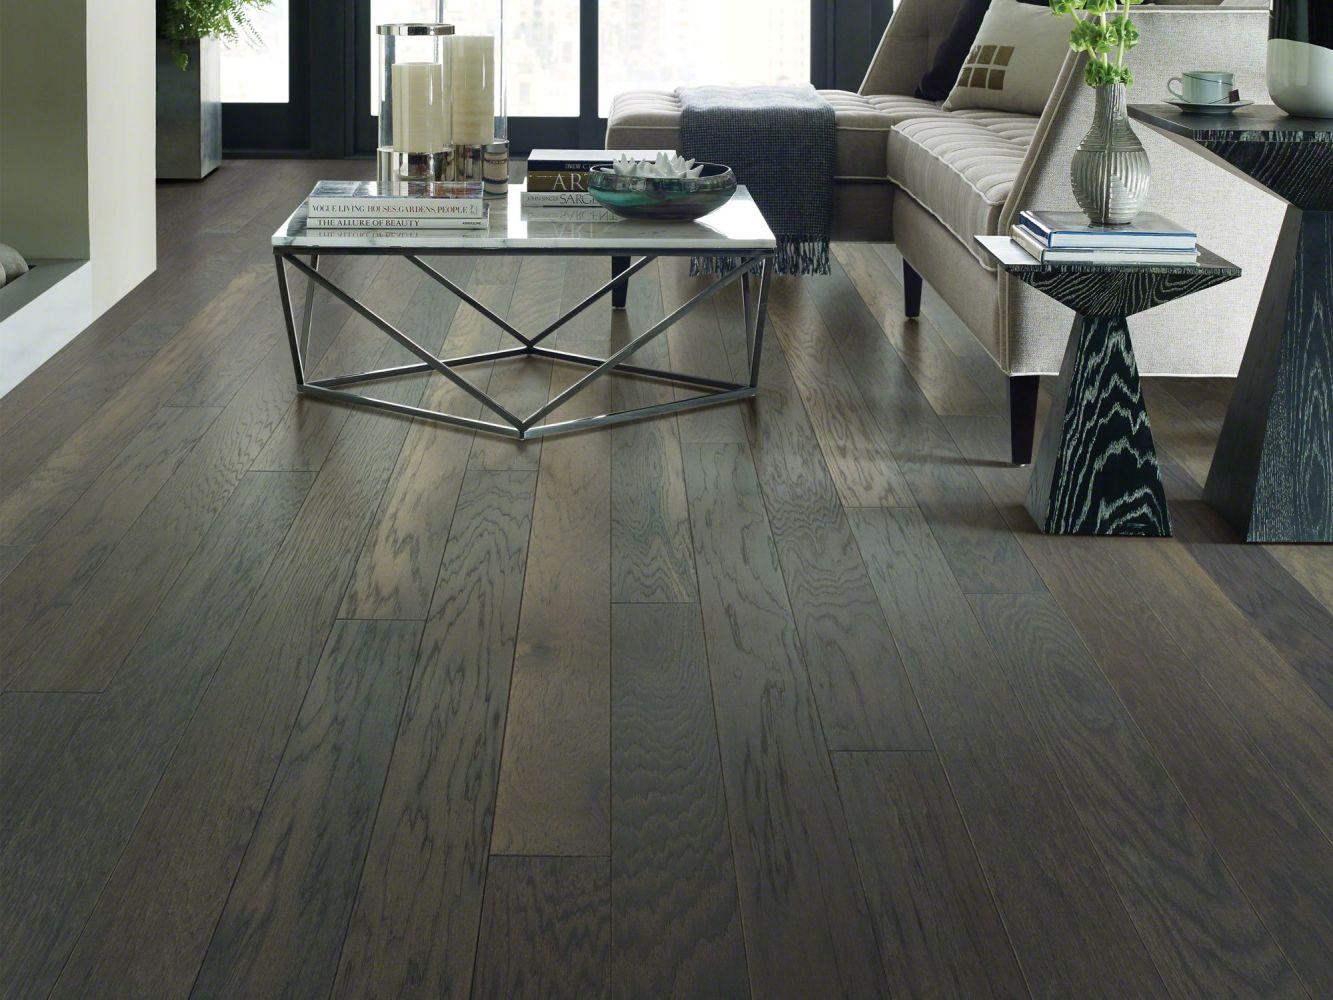 Shaw Floors Shaw Hardwoods Collate Sable 09022_SMW11